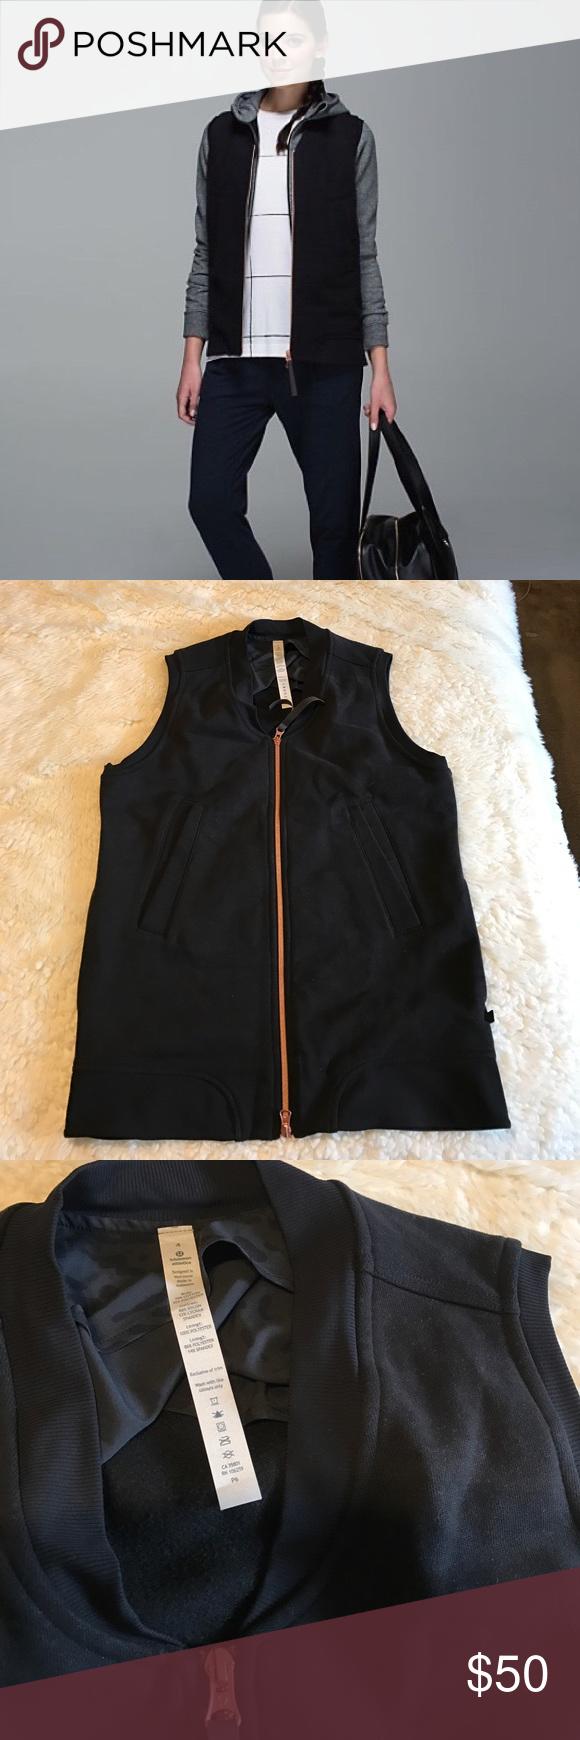 Lululemon vest Perfect condition, like new lululemon athletica Jackets & Coats Vests